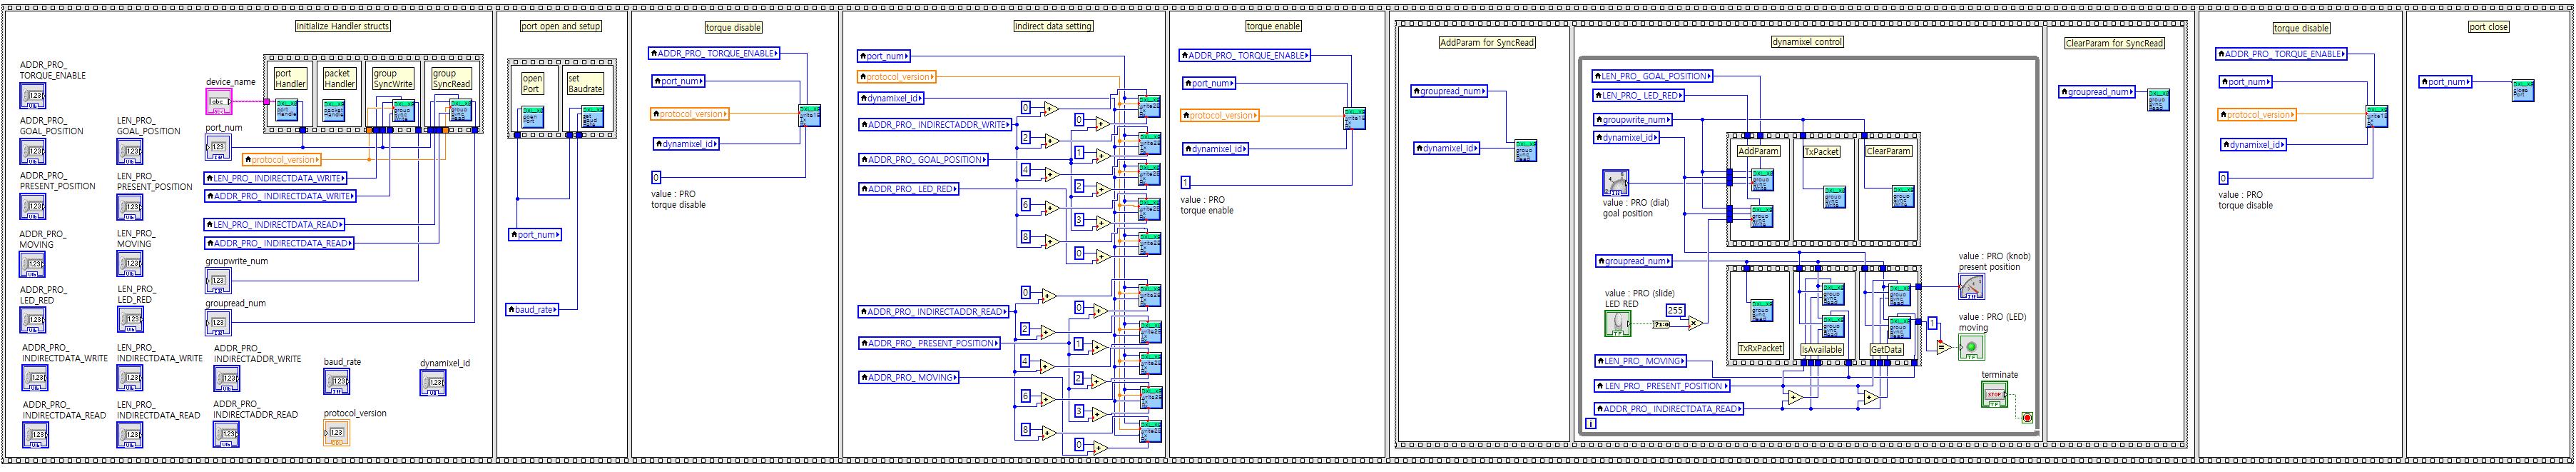 Dynamixelsdk Labview Block Diagram Indirect Address Protocol 20